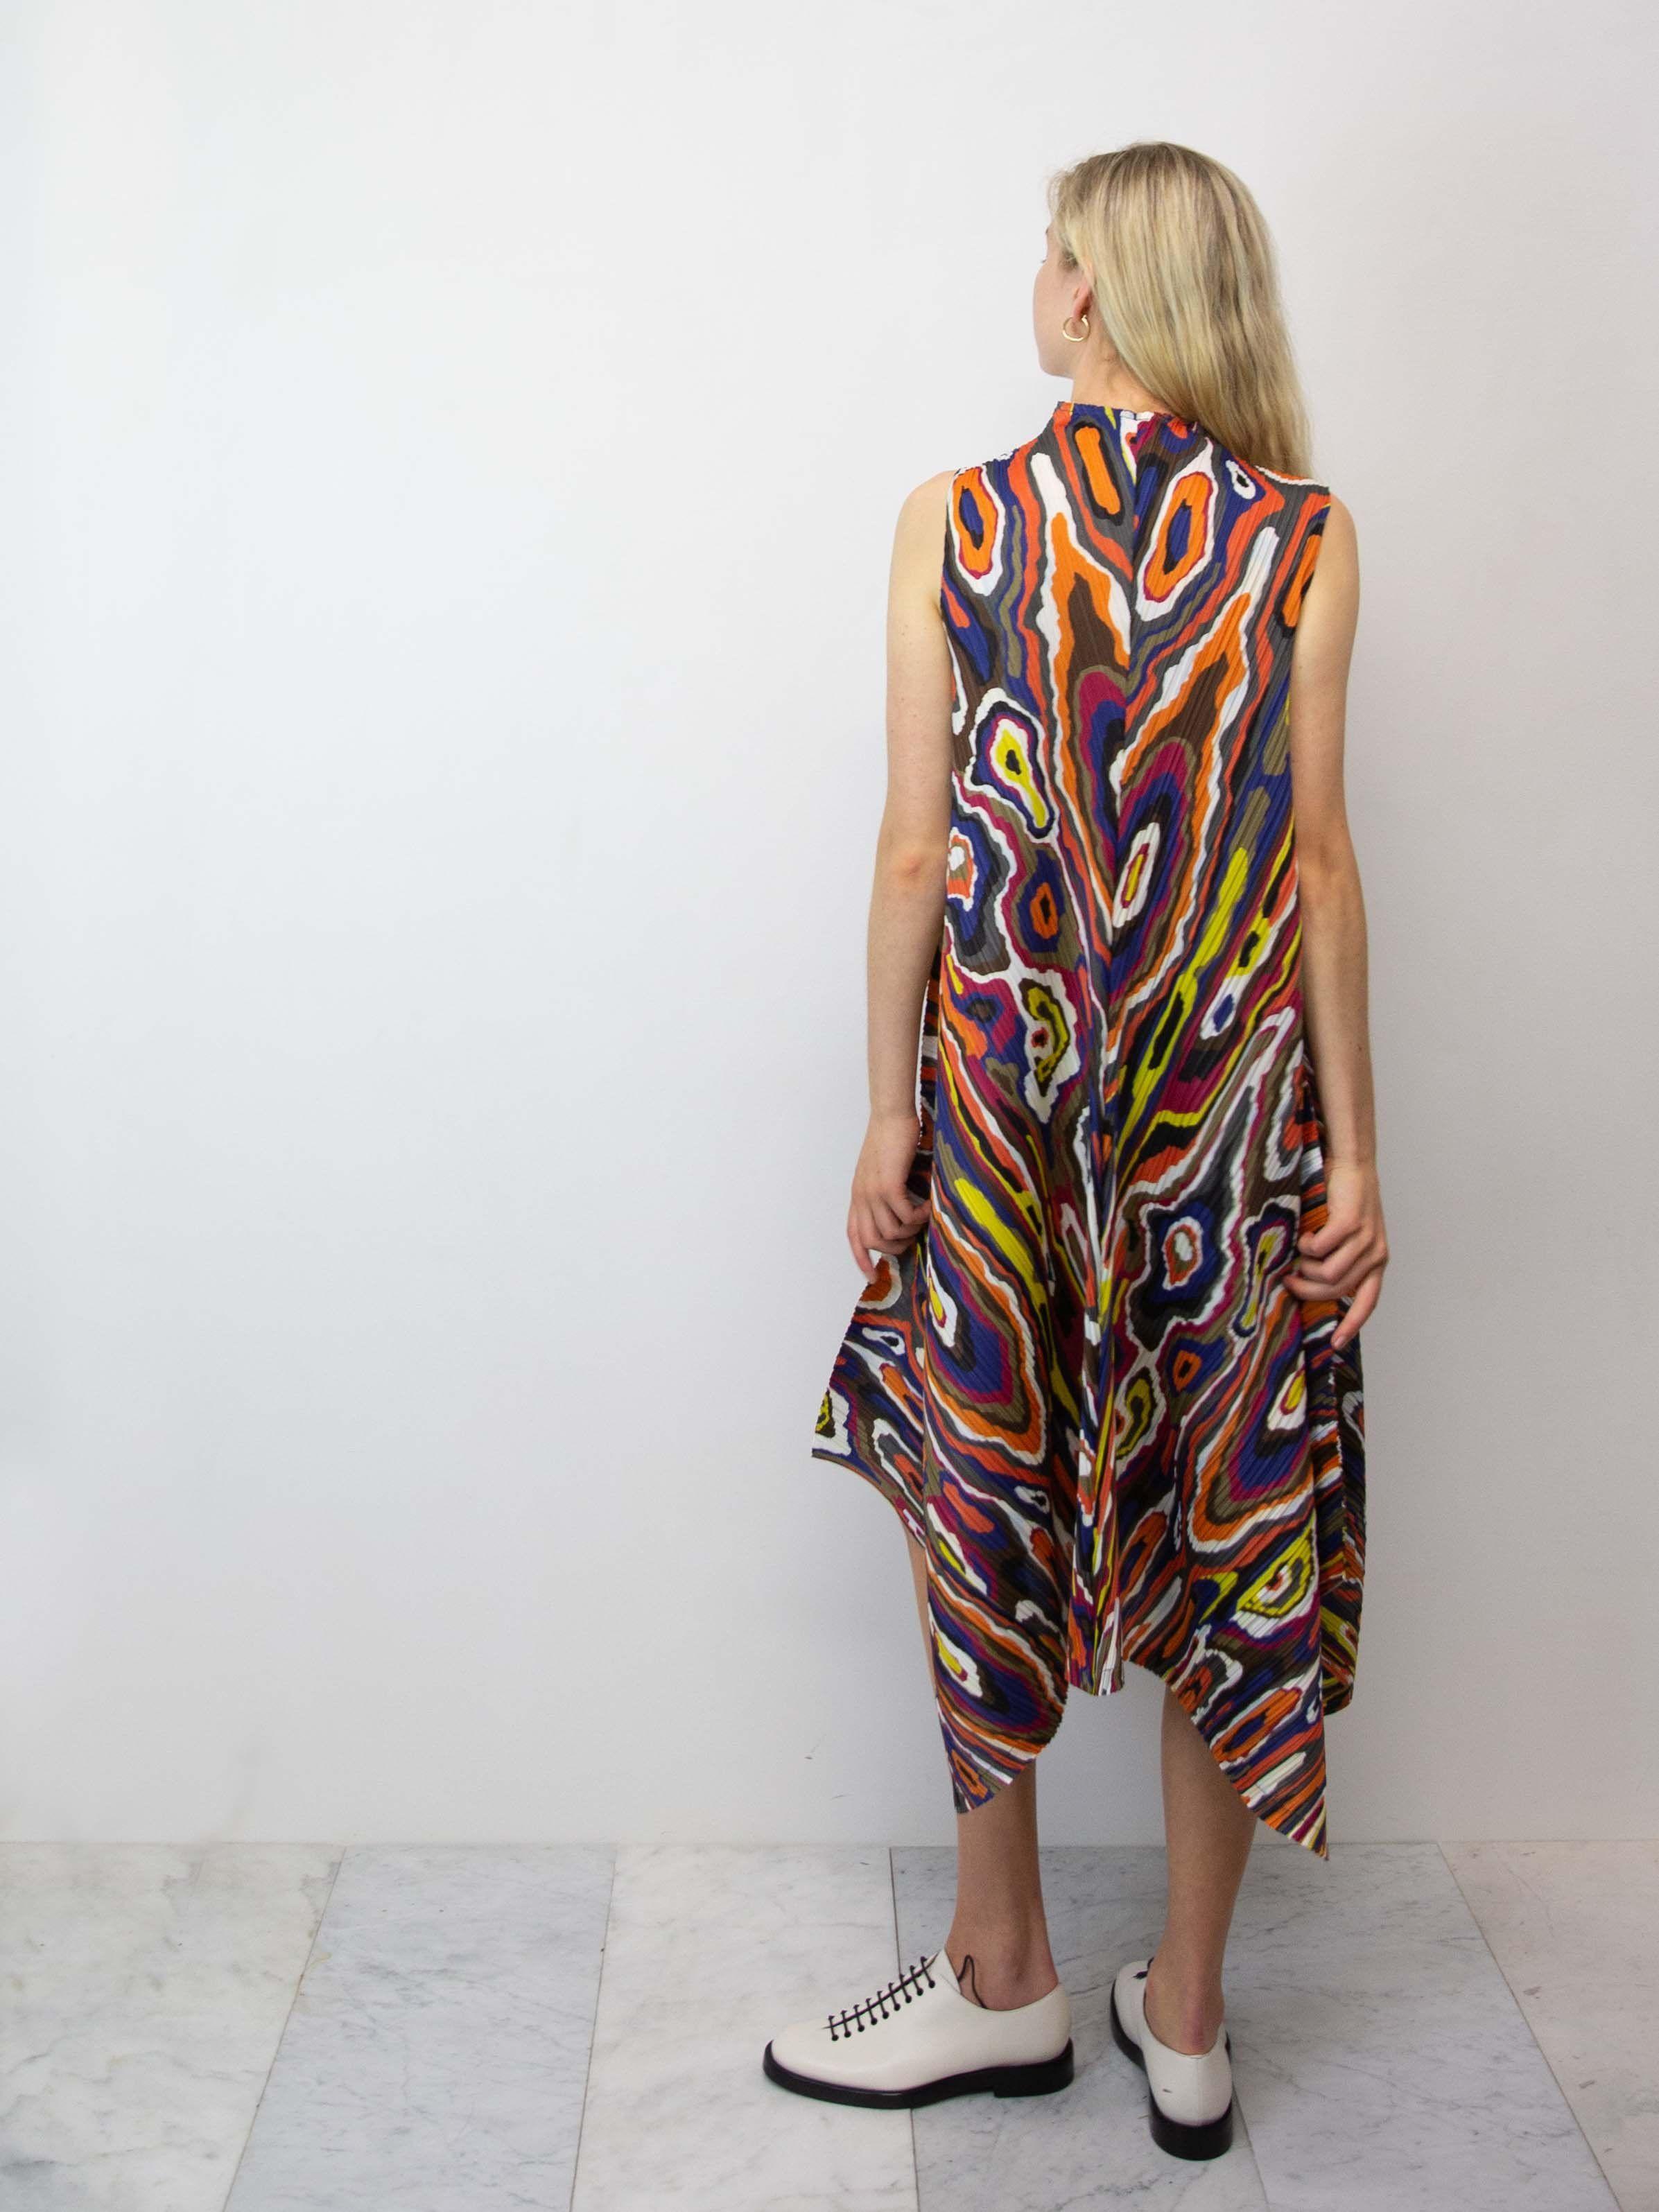 37a14218f907c PLEATS PLEASE ISSEY MIYAKE Wooden Pattern Dress in 2019 | mo | Dress ...